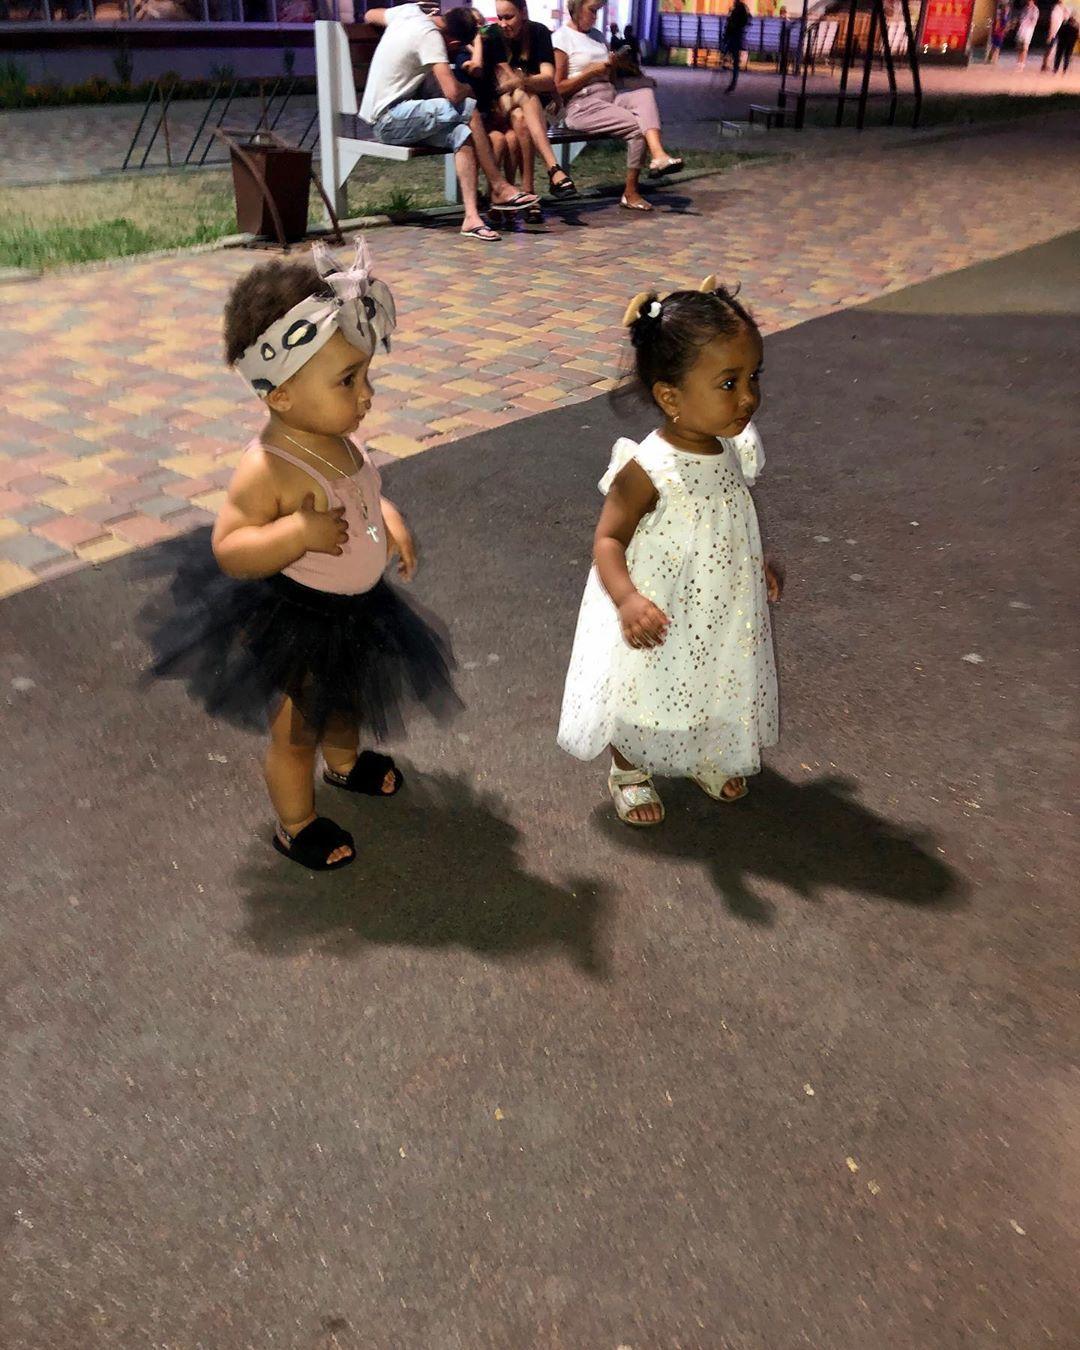 Подружки 🧚🏽♀️@lol_love80   #beautiful#instababygirl#instababymodel#instakids#instafollow#baby#babygirl#girls#pretty#prettygirls#prettylittleliars#kids#beautifulgirls#beautifulbaby#cute#cutebabies#cutegirls😘#princess#instapretty#little#littlegirl#littlegirl#инстадети#мулатка#мулаткашоколадка#russia#stavropol#parentsofmixedkidz